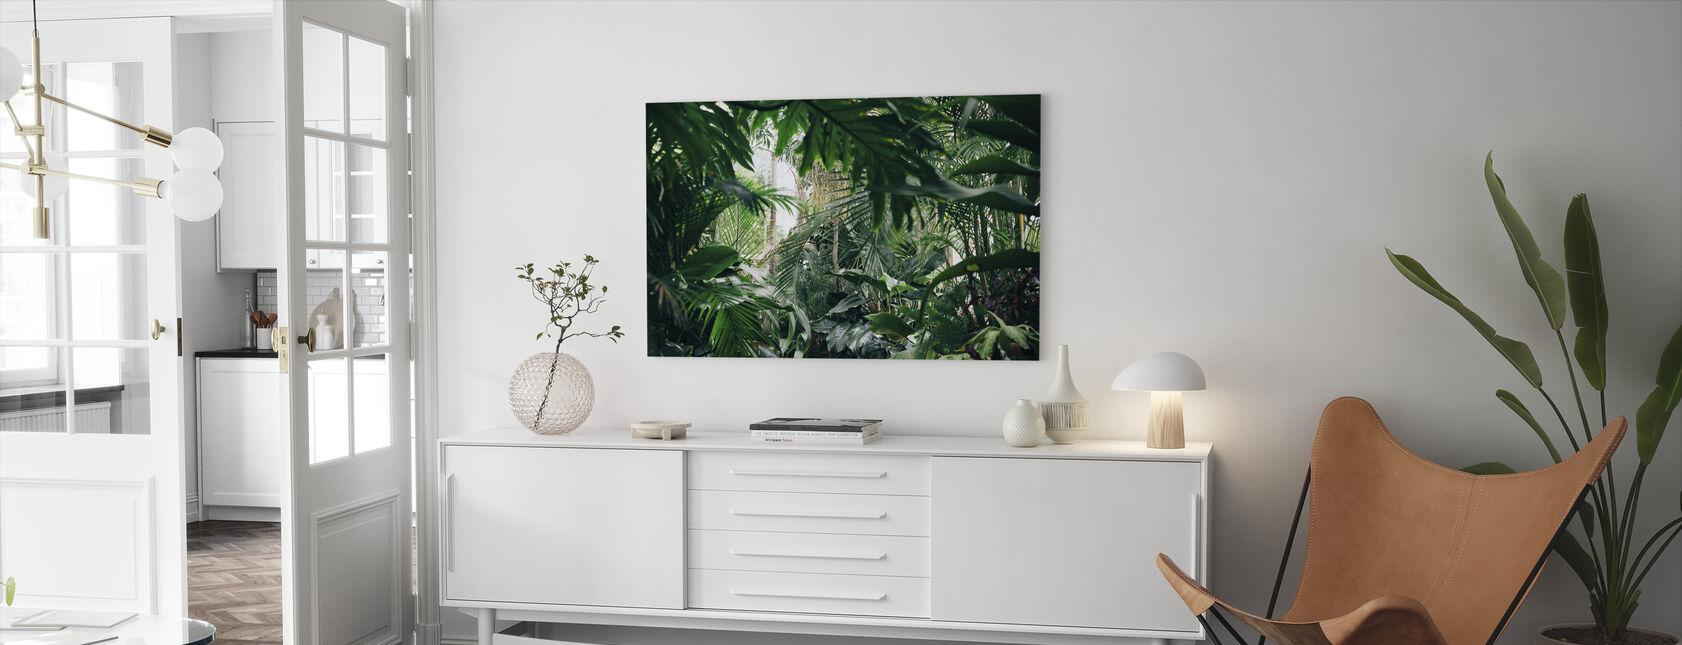 Piante Giung - Stampa su tela - Salotto